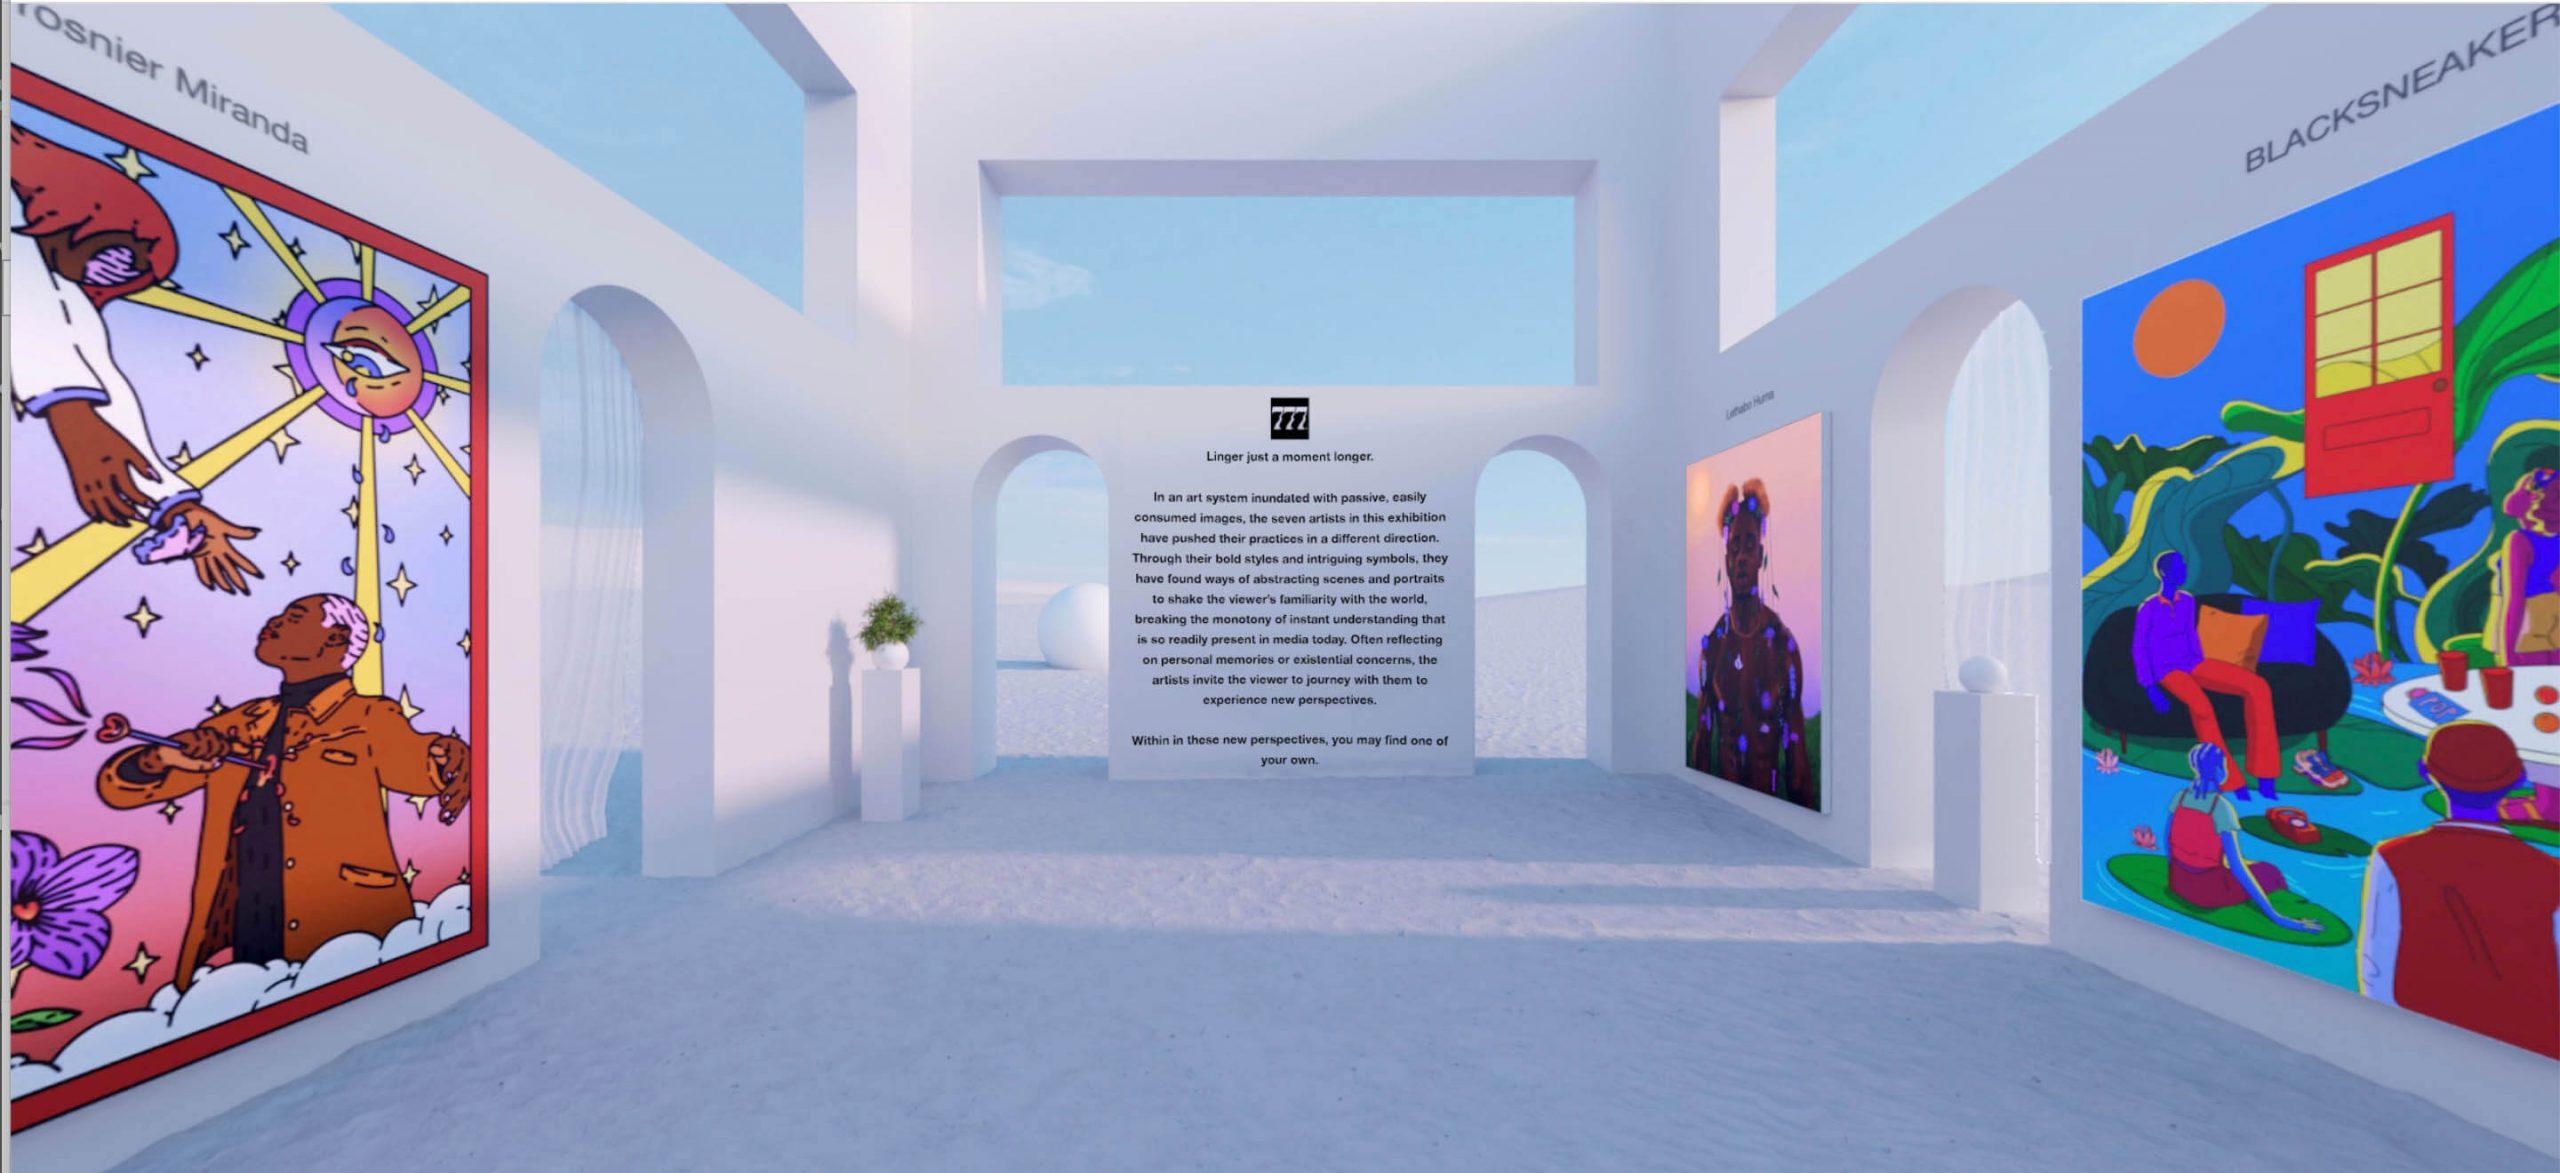 System Shock - 777 Exhibition for Agora Digital Art